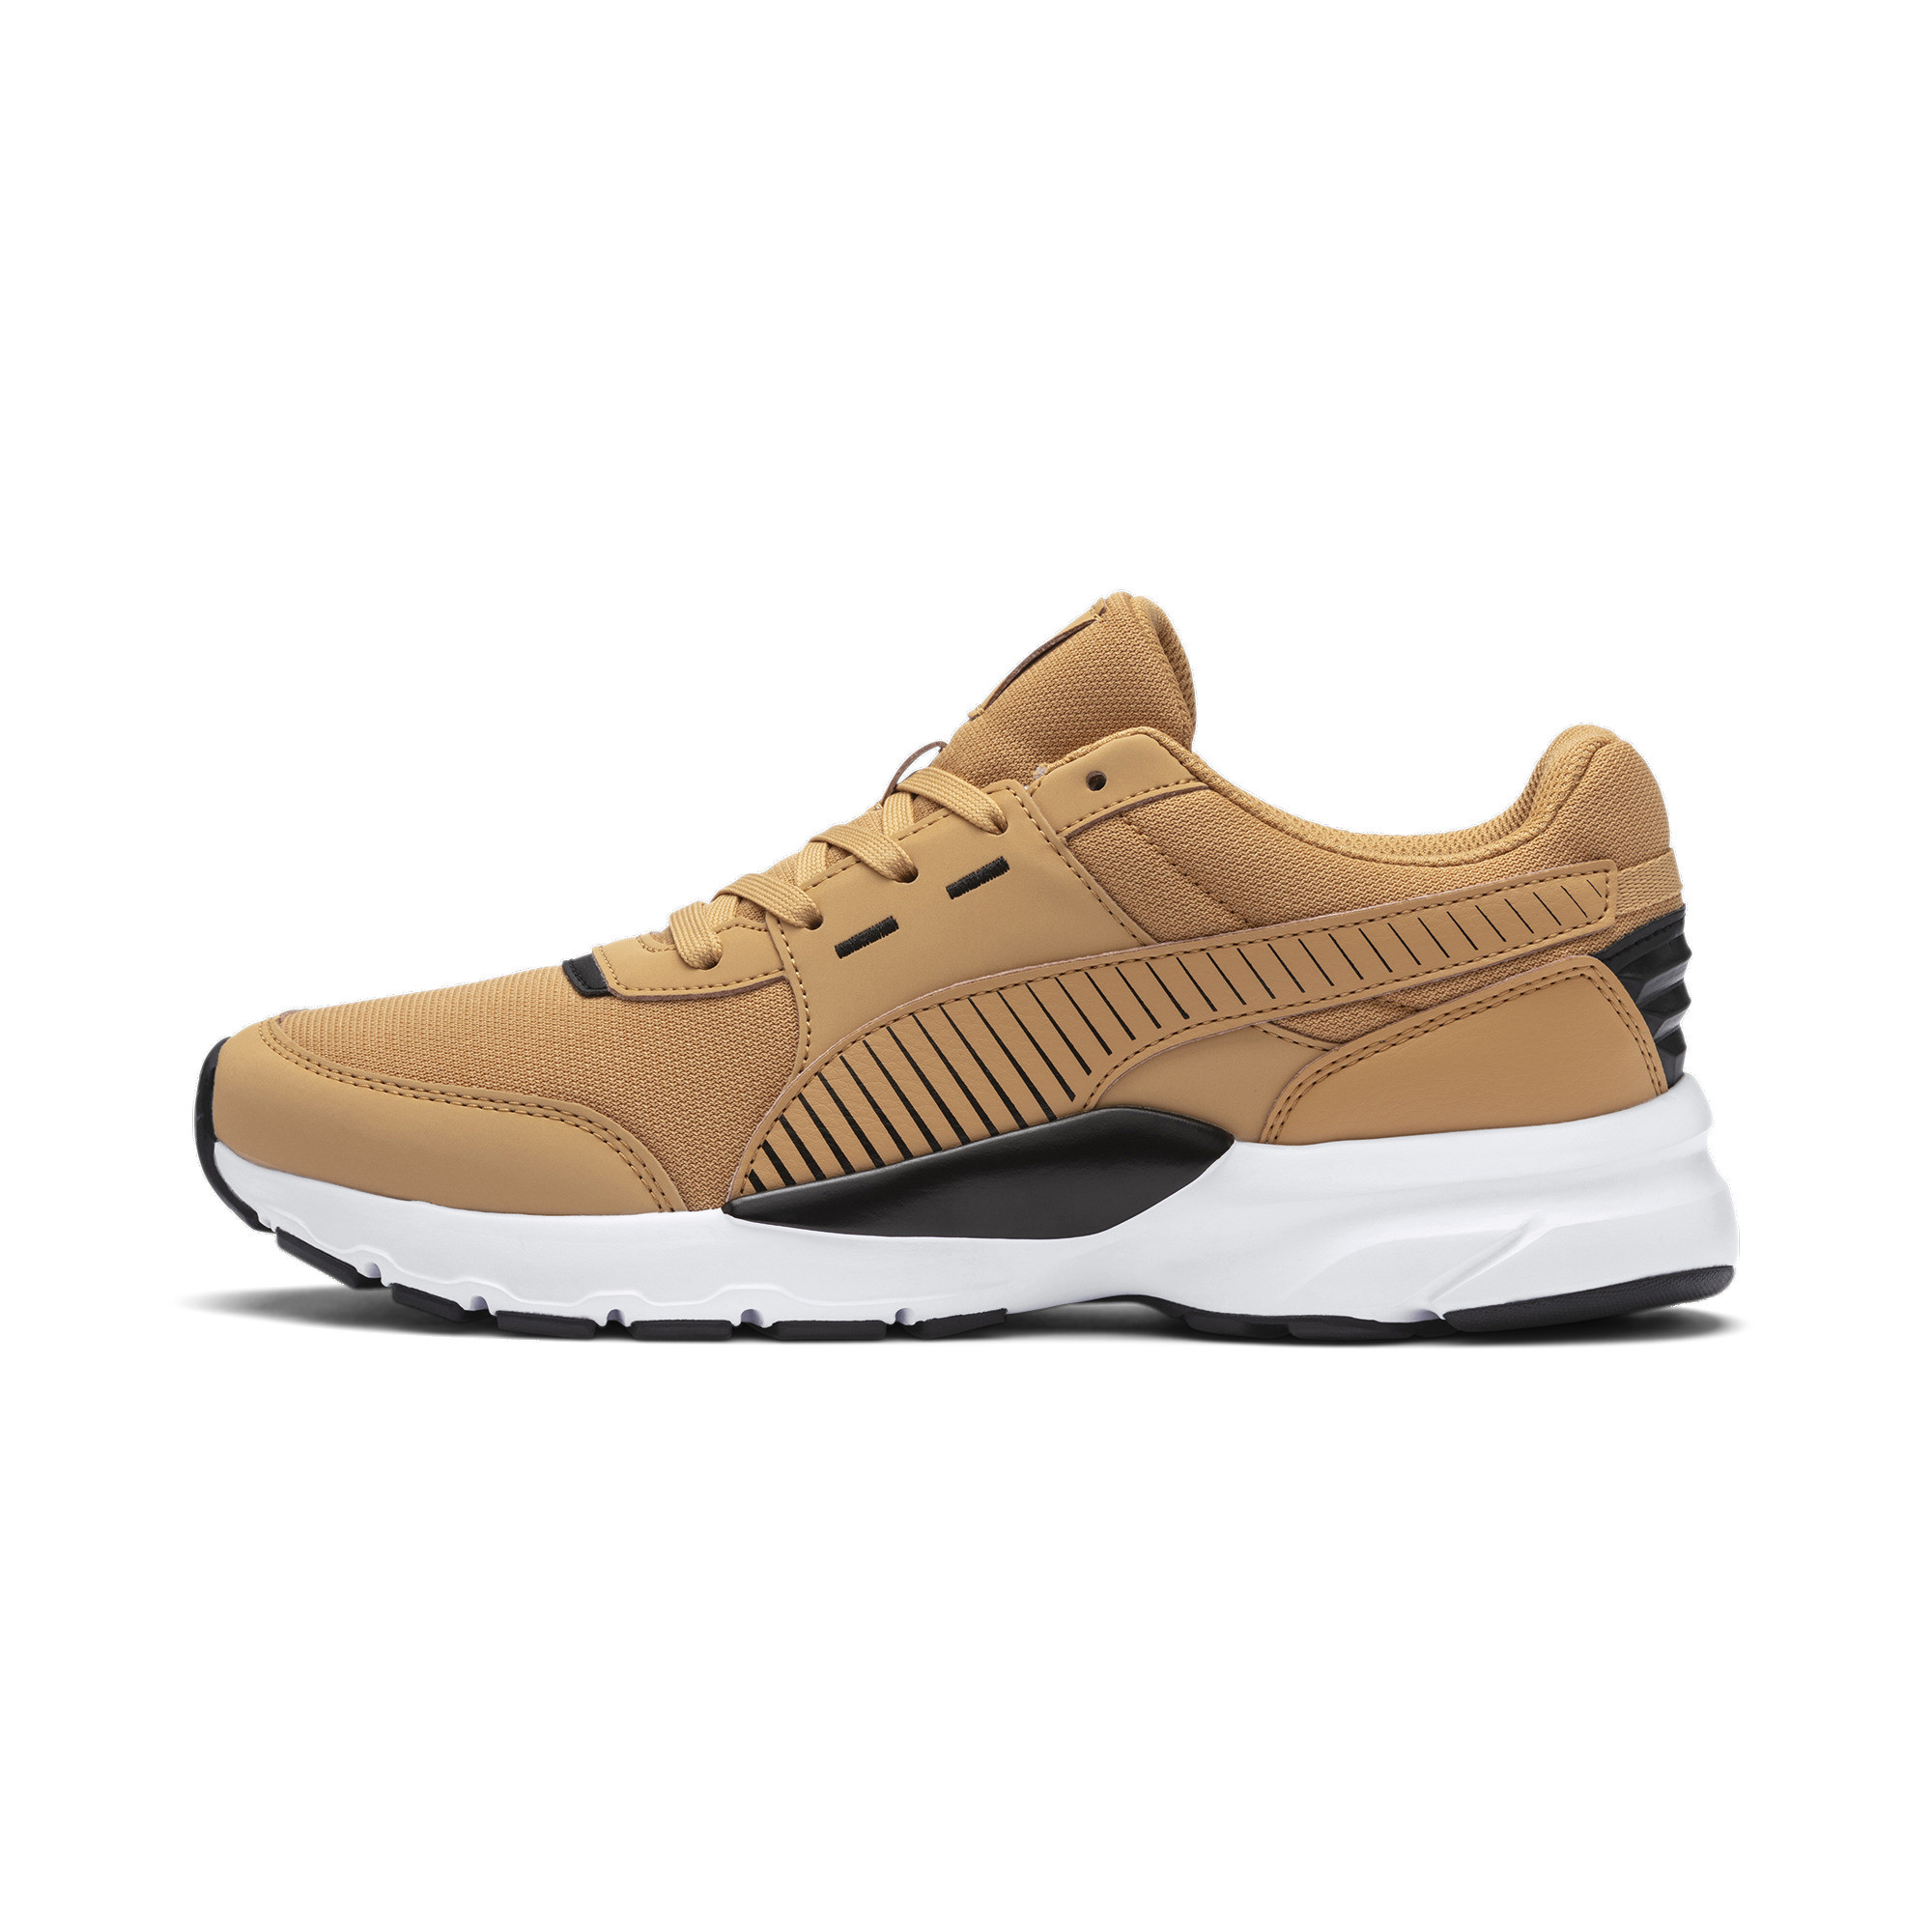 PUMA-Future-Runner-SL-Sneaker-Unisex-Schuhe-Basics-Neu Indexbild 8